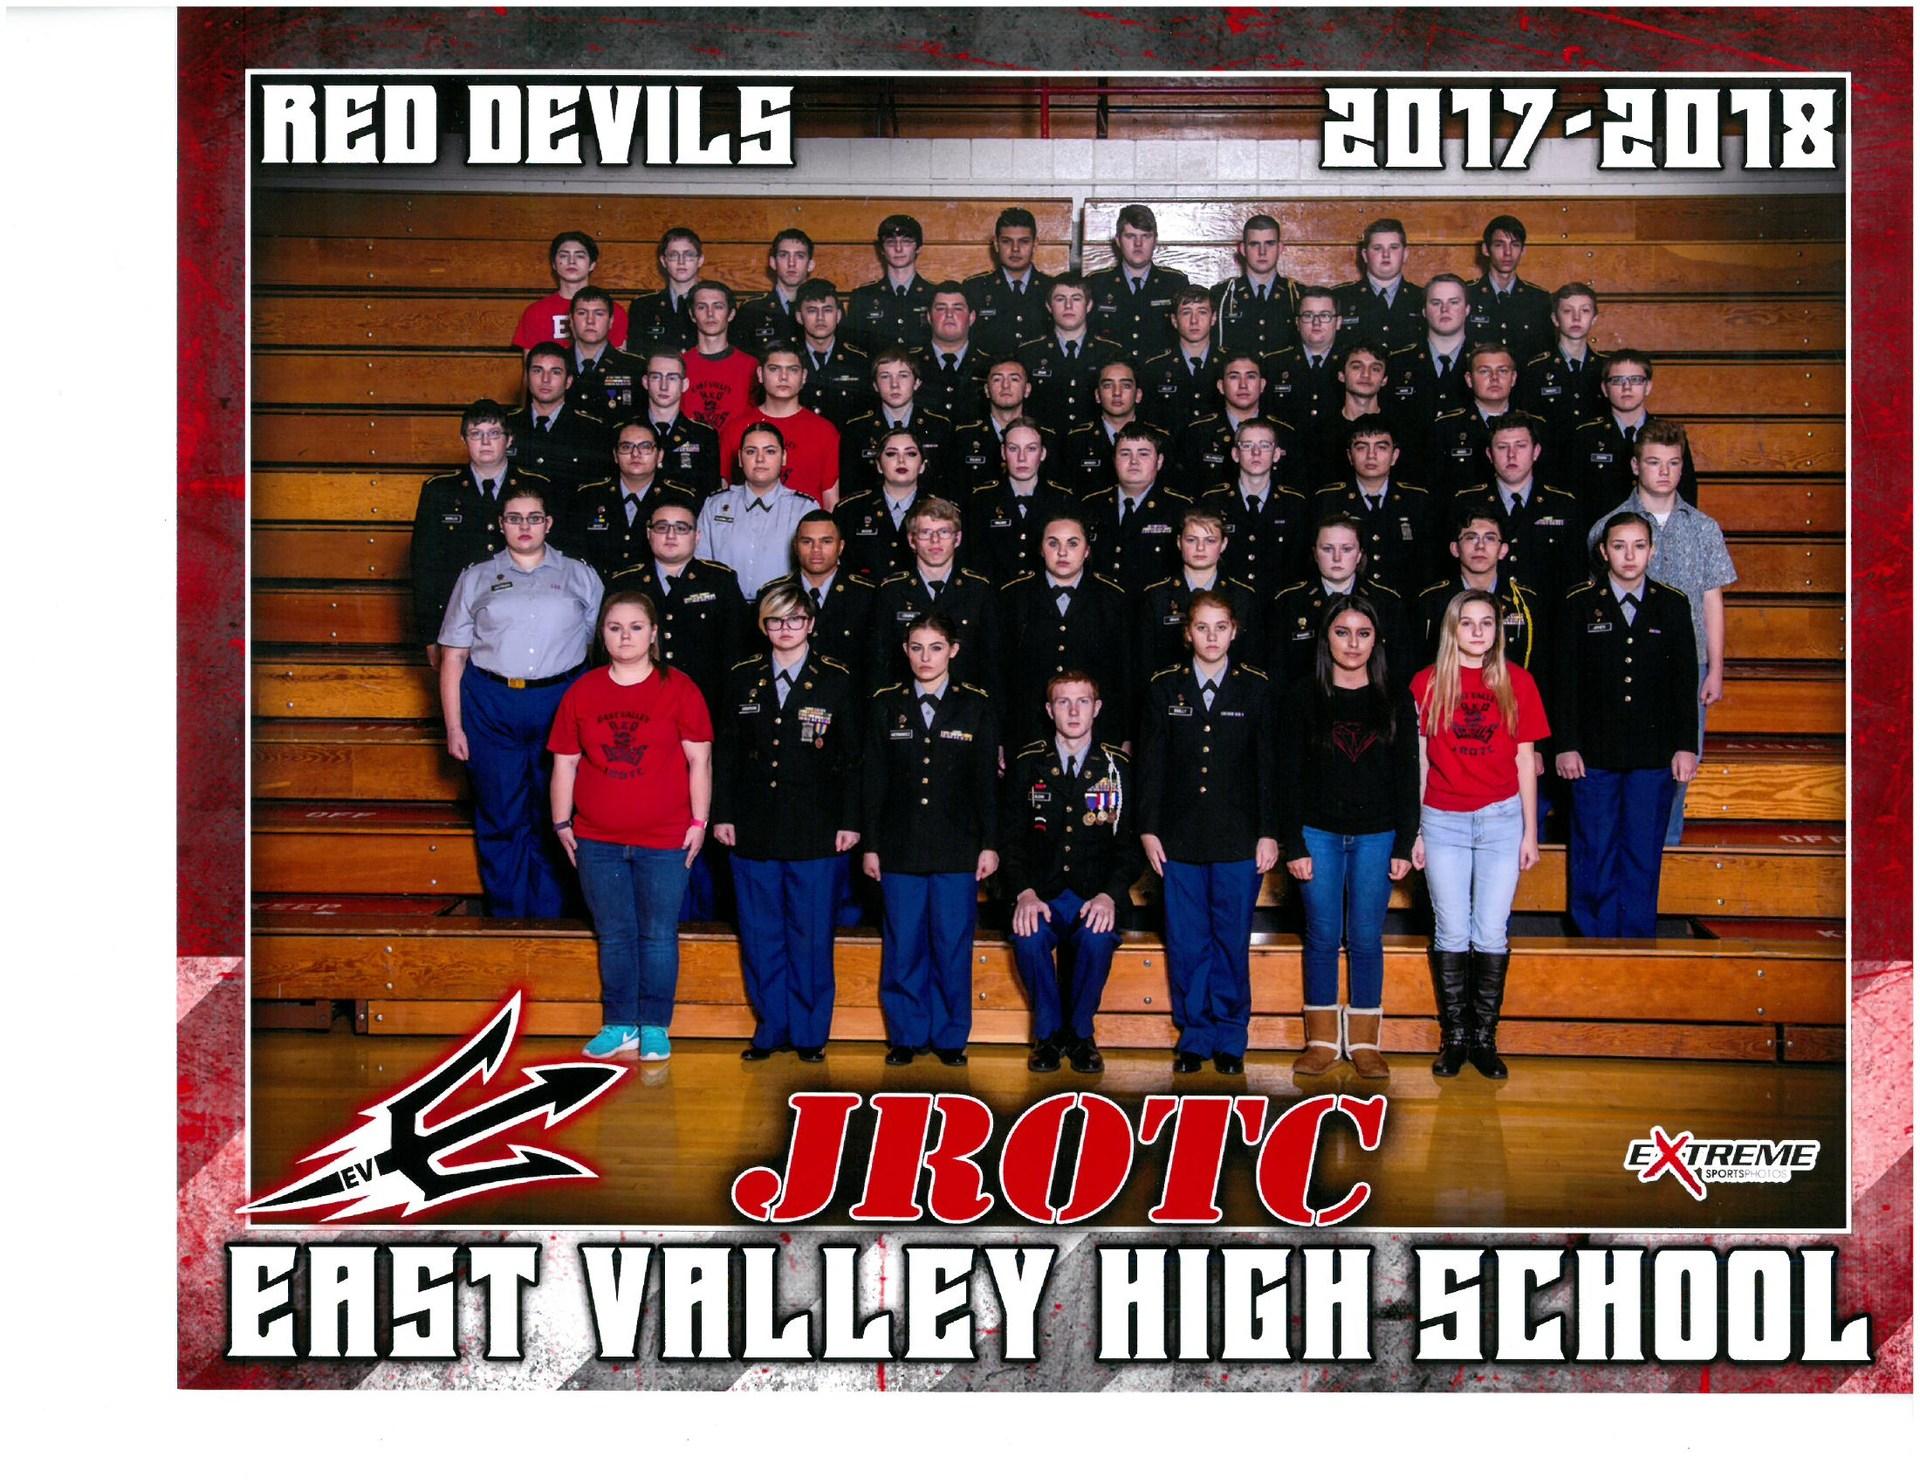 East Valley High School JROTC team for the 2017-2018 school year